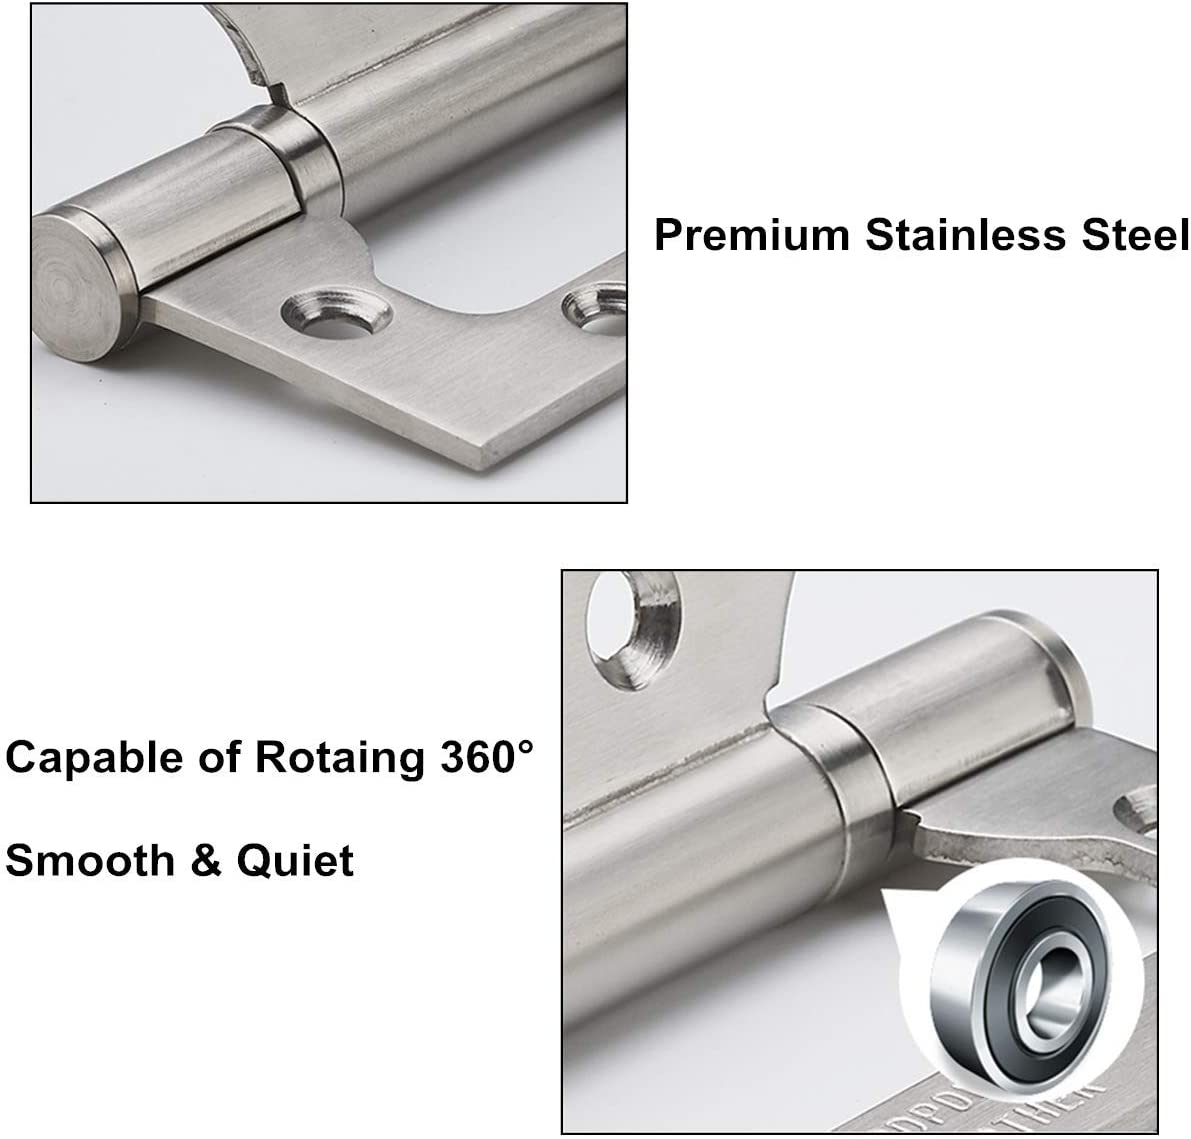 Pin Model Number FBP100GF 4in. 100mm Buyers Weld-On Bullet Hinge x 19.5mm; 10mm Dia